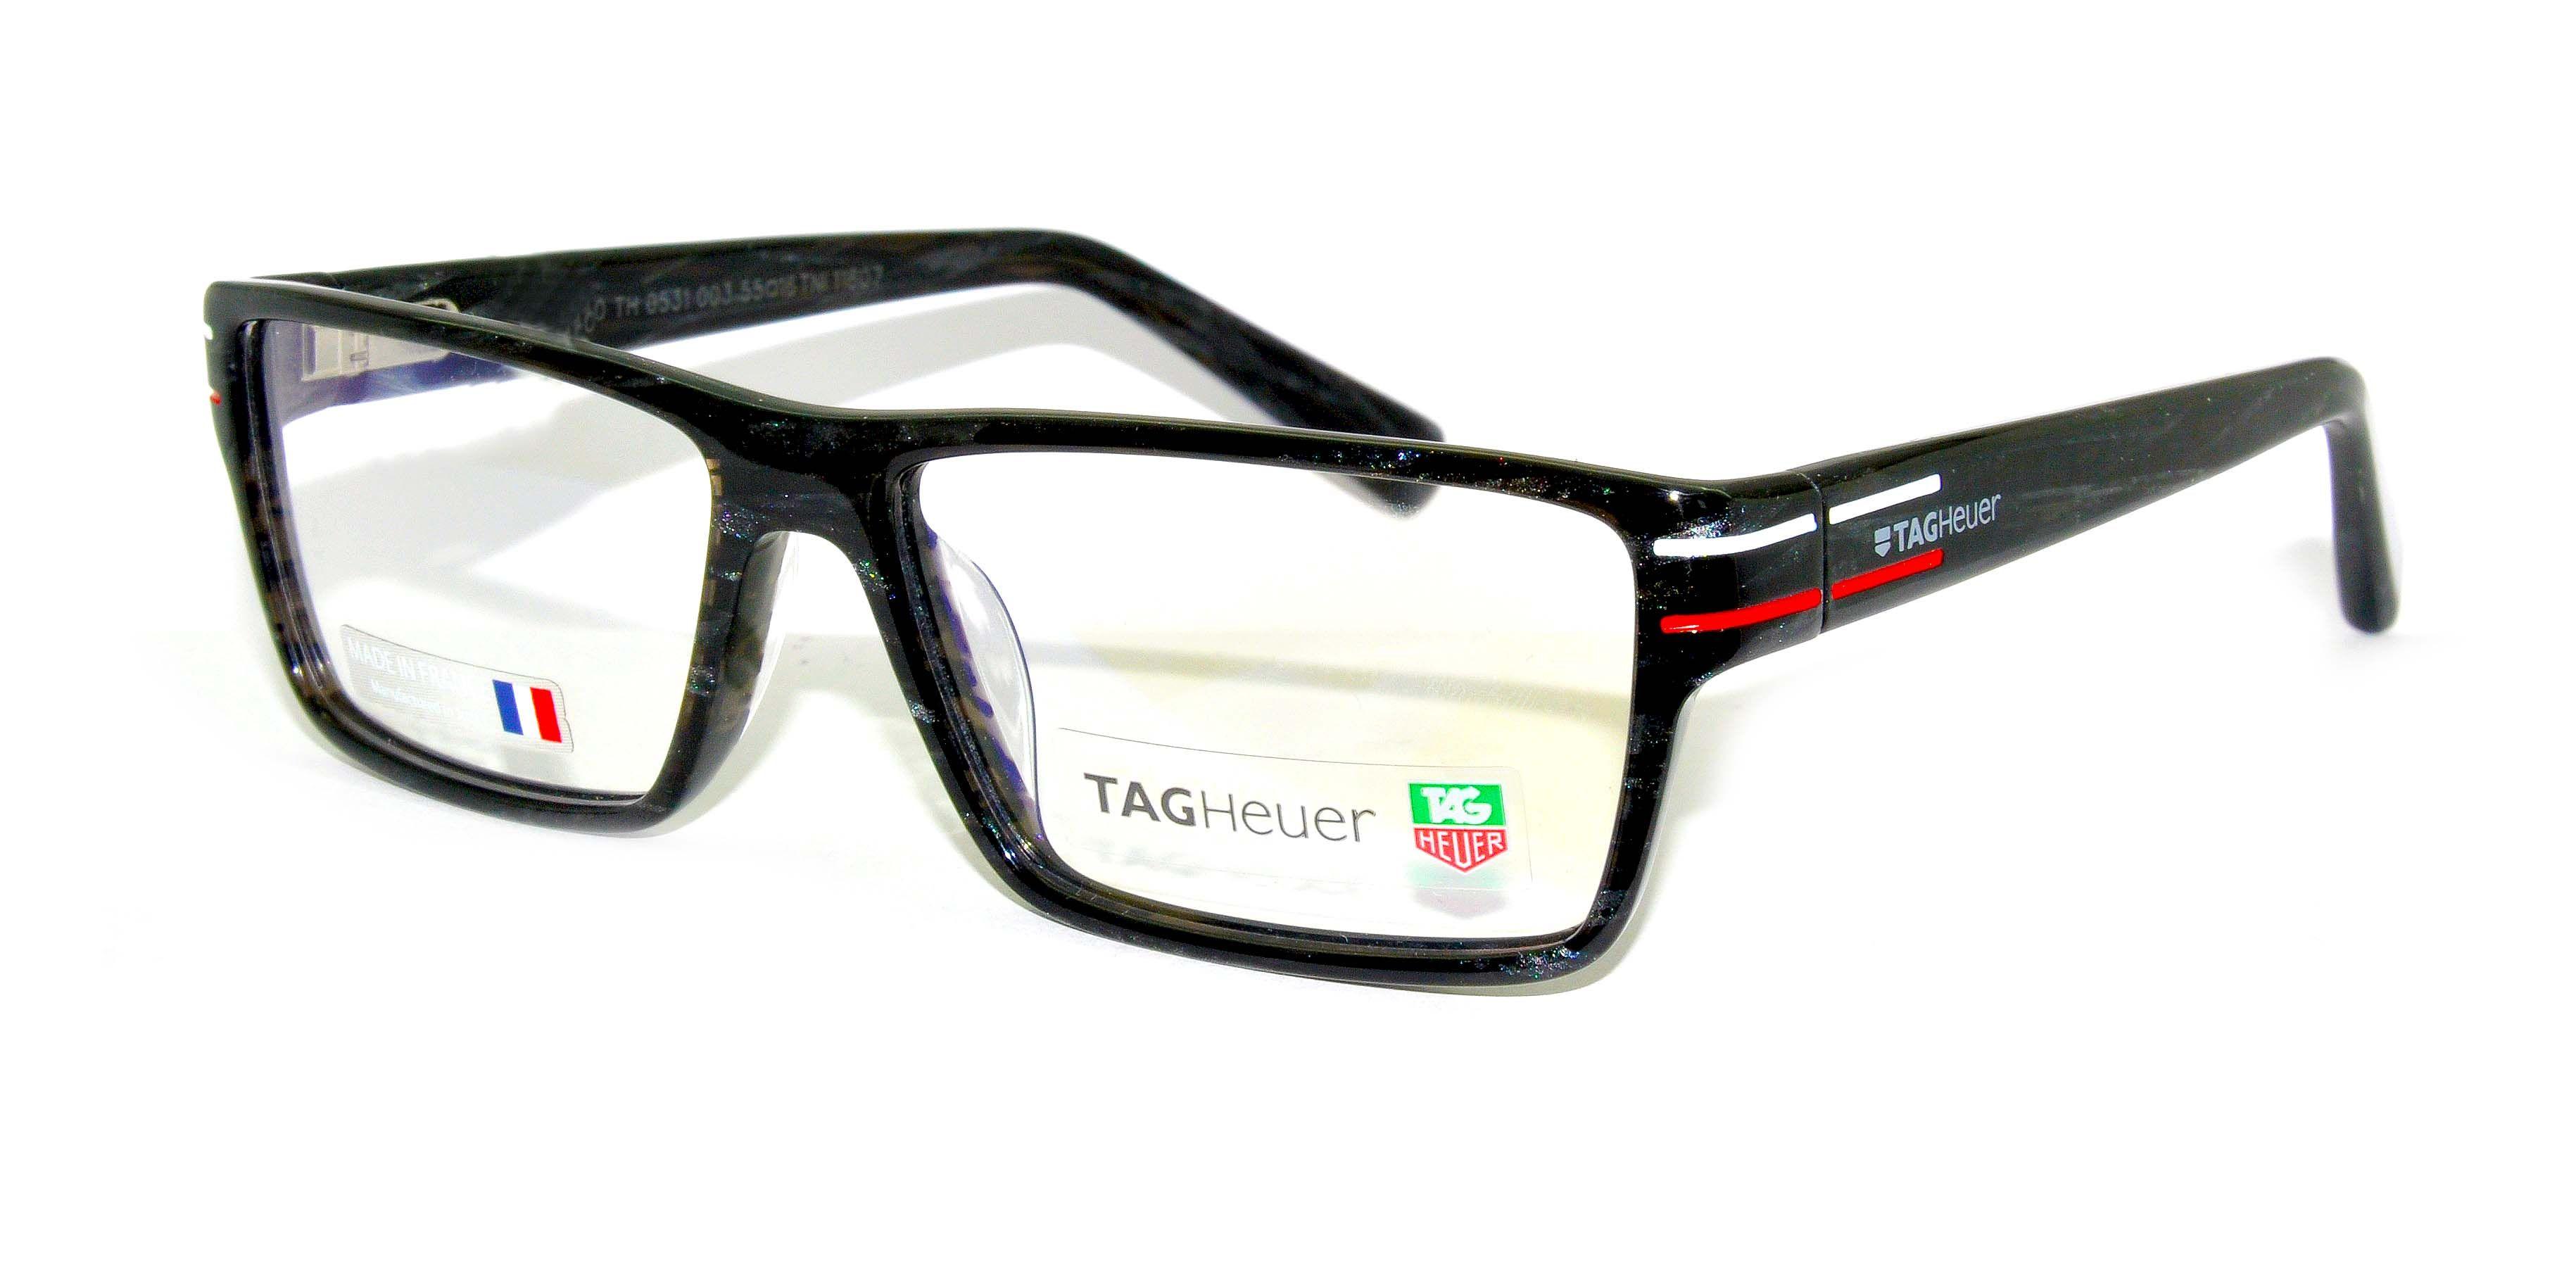 Tag heuer eyeglasses frames uk - Glasses Tag Heuer